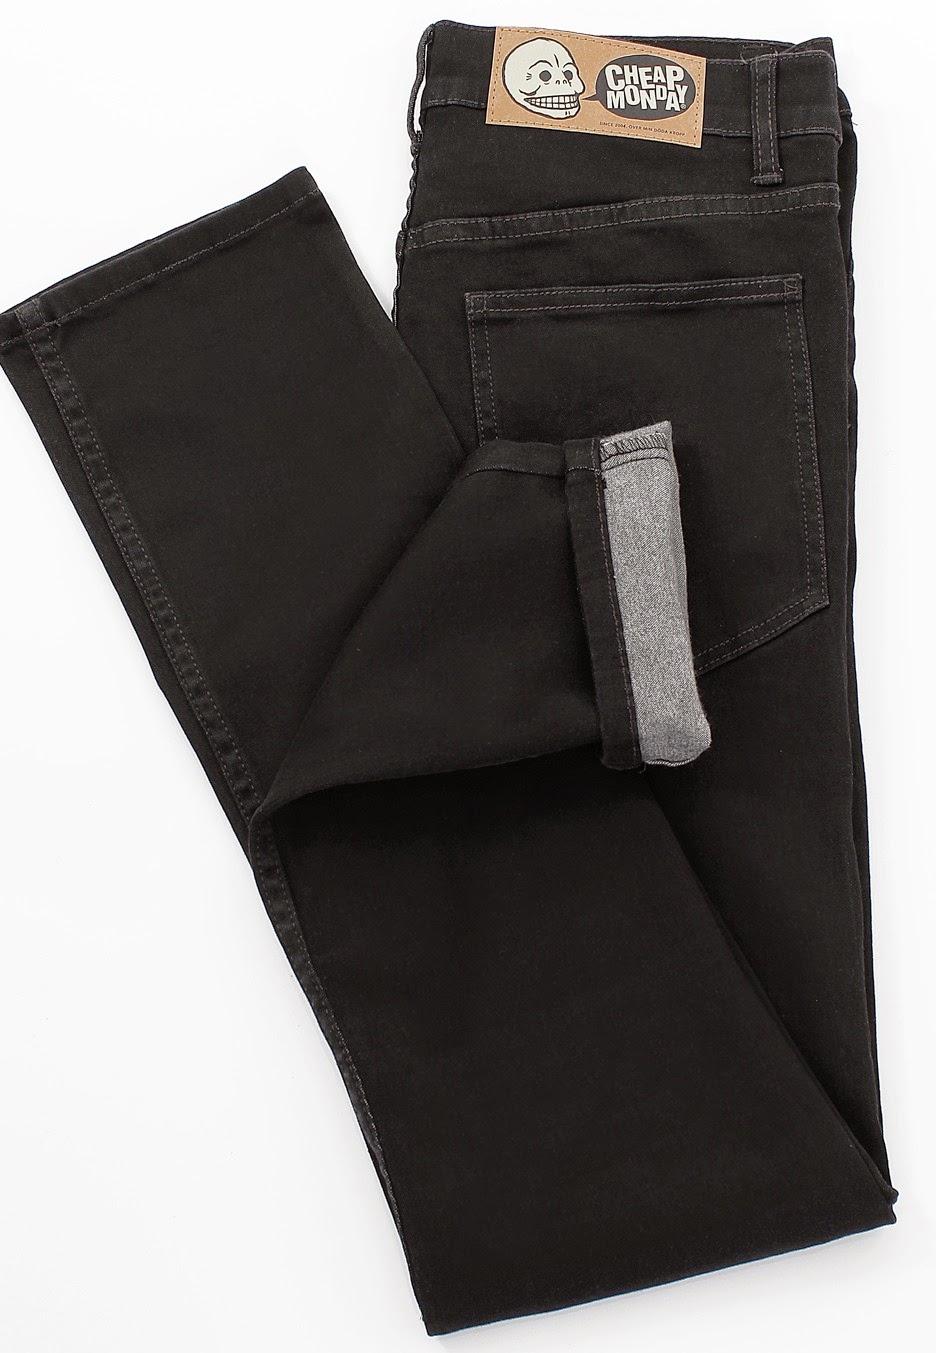 Celana Jeans Pria, Jual Celana Jeans, Celana Jeans Murah, Grosir Celana Jeans, celana Jeans Cheap Monday, Celana JEans hitam pekat